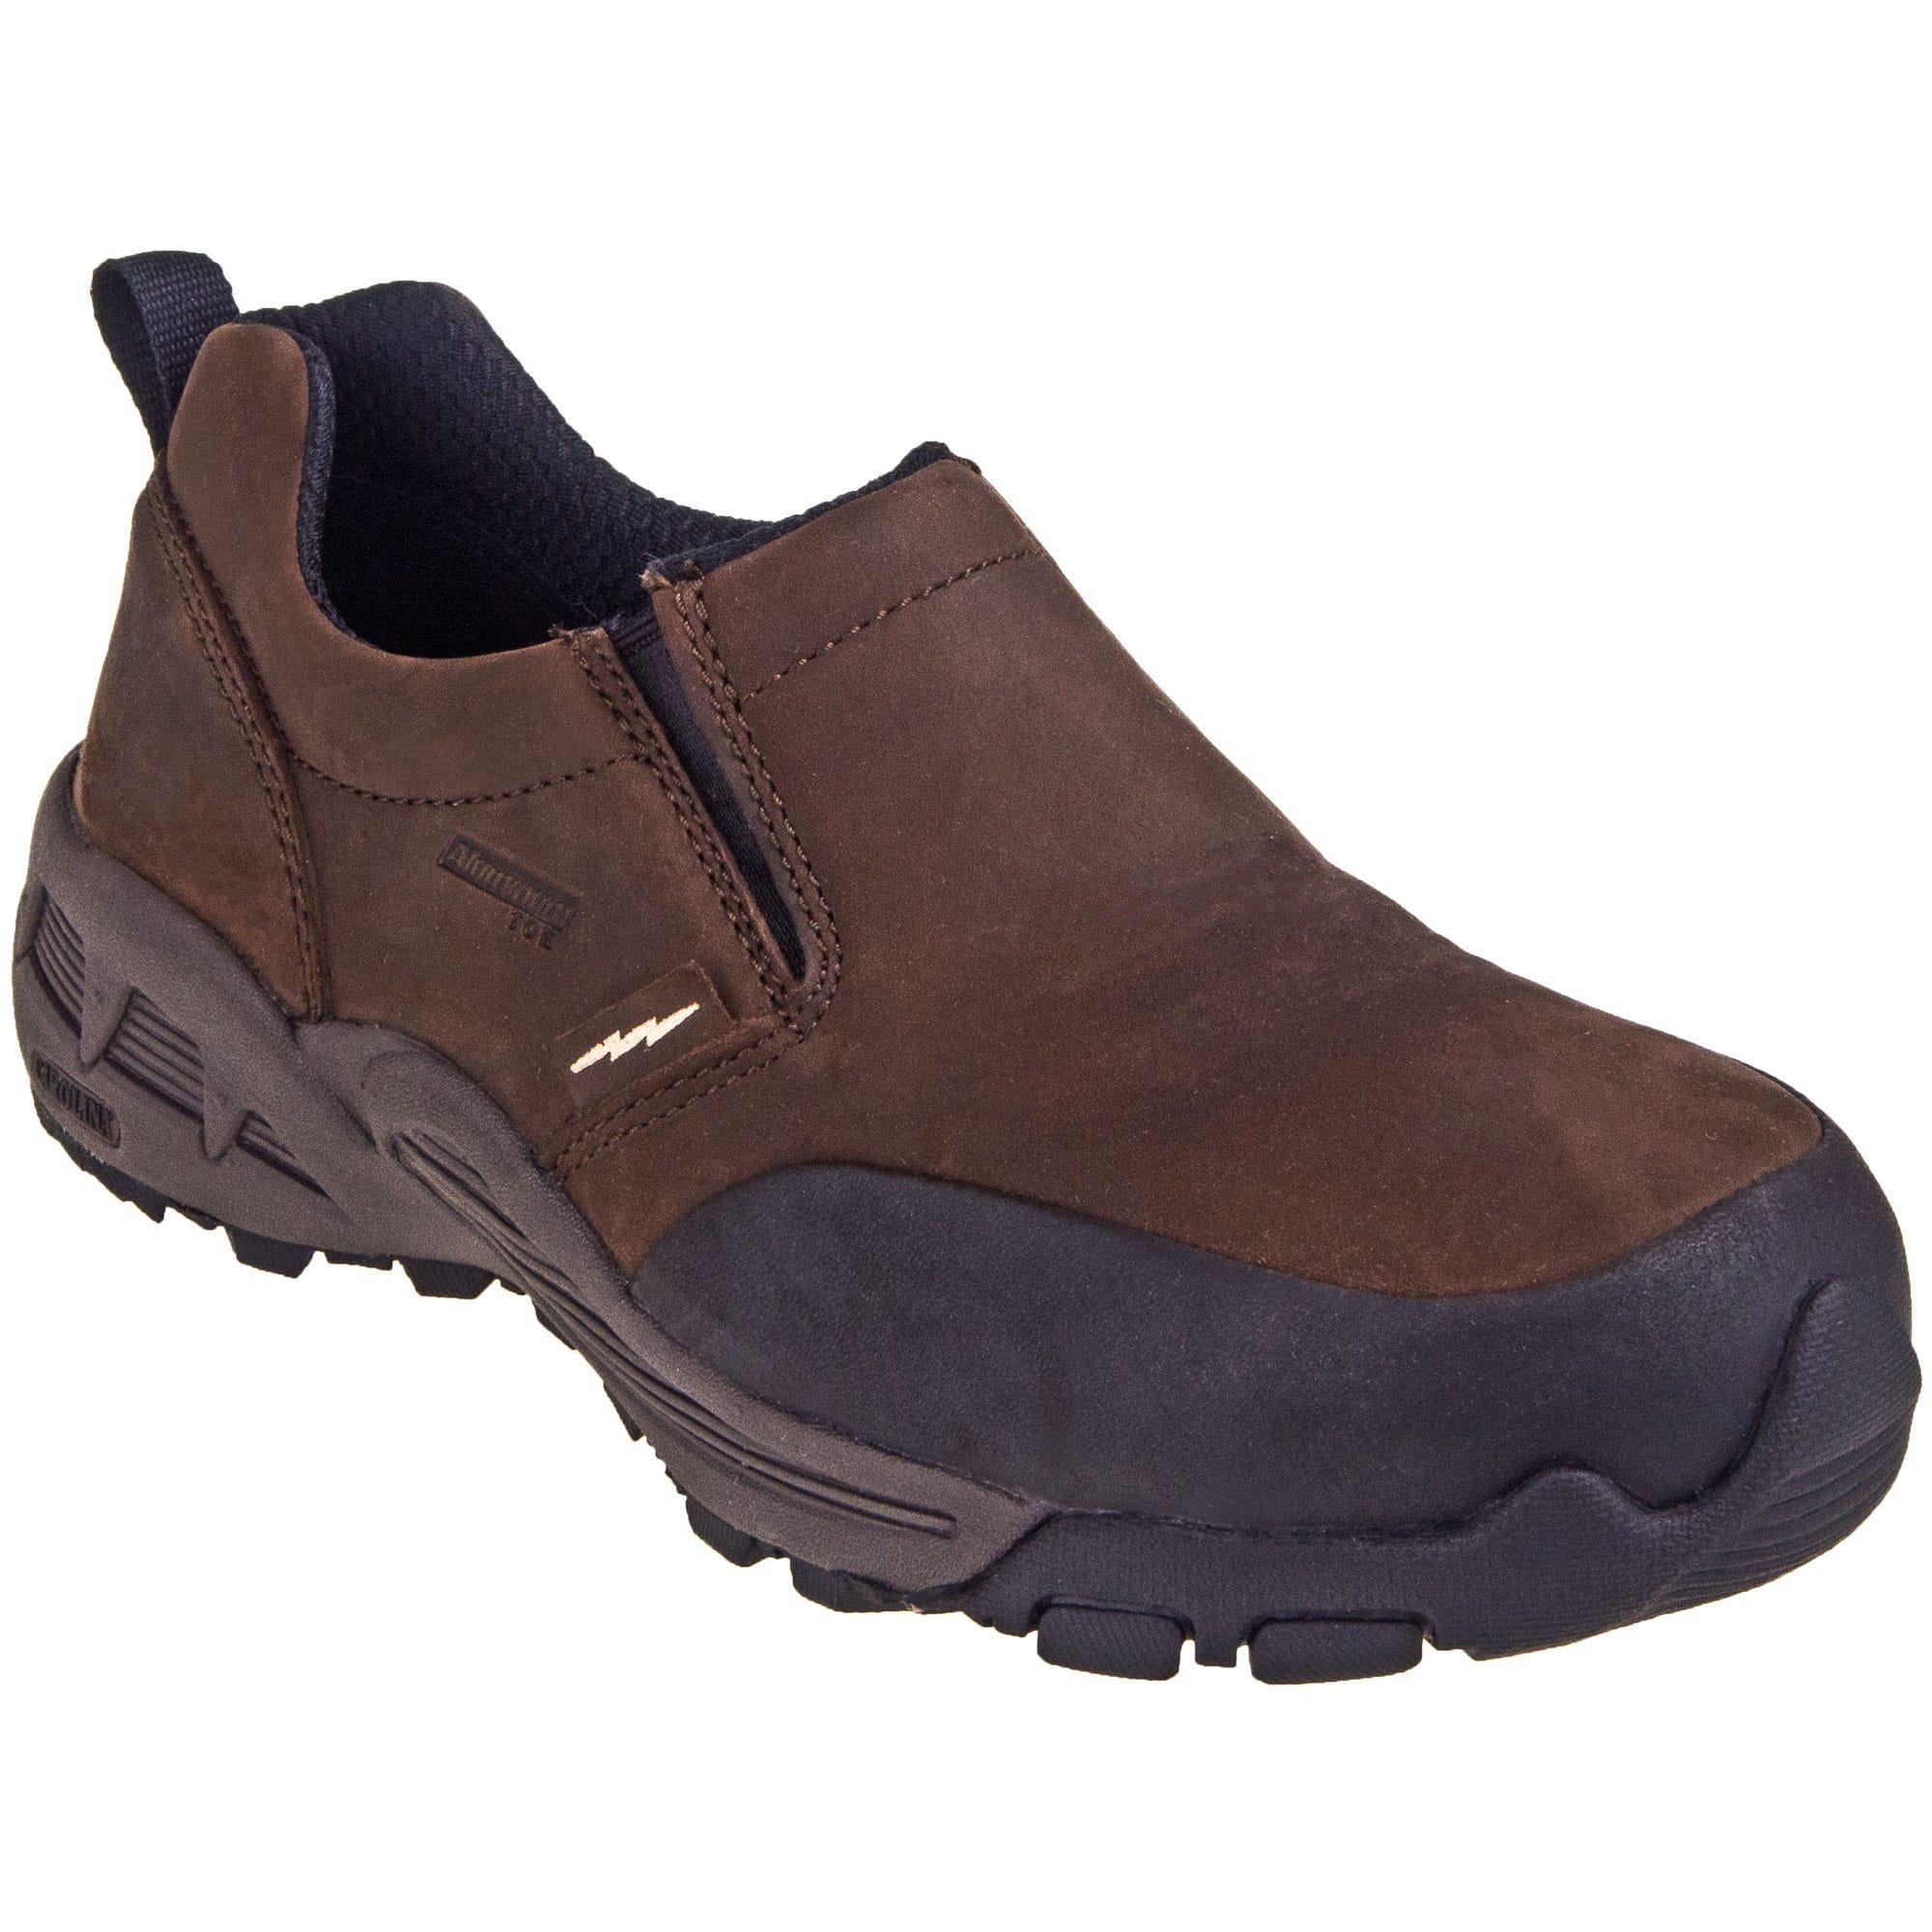 Carolina CA6550 Brown Oil-Resistant ESD Leather Aluminum Toe Slip-On Shoes